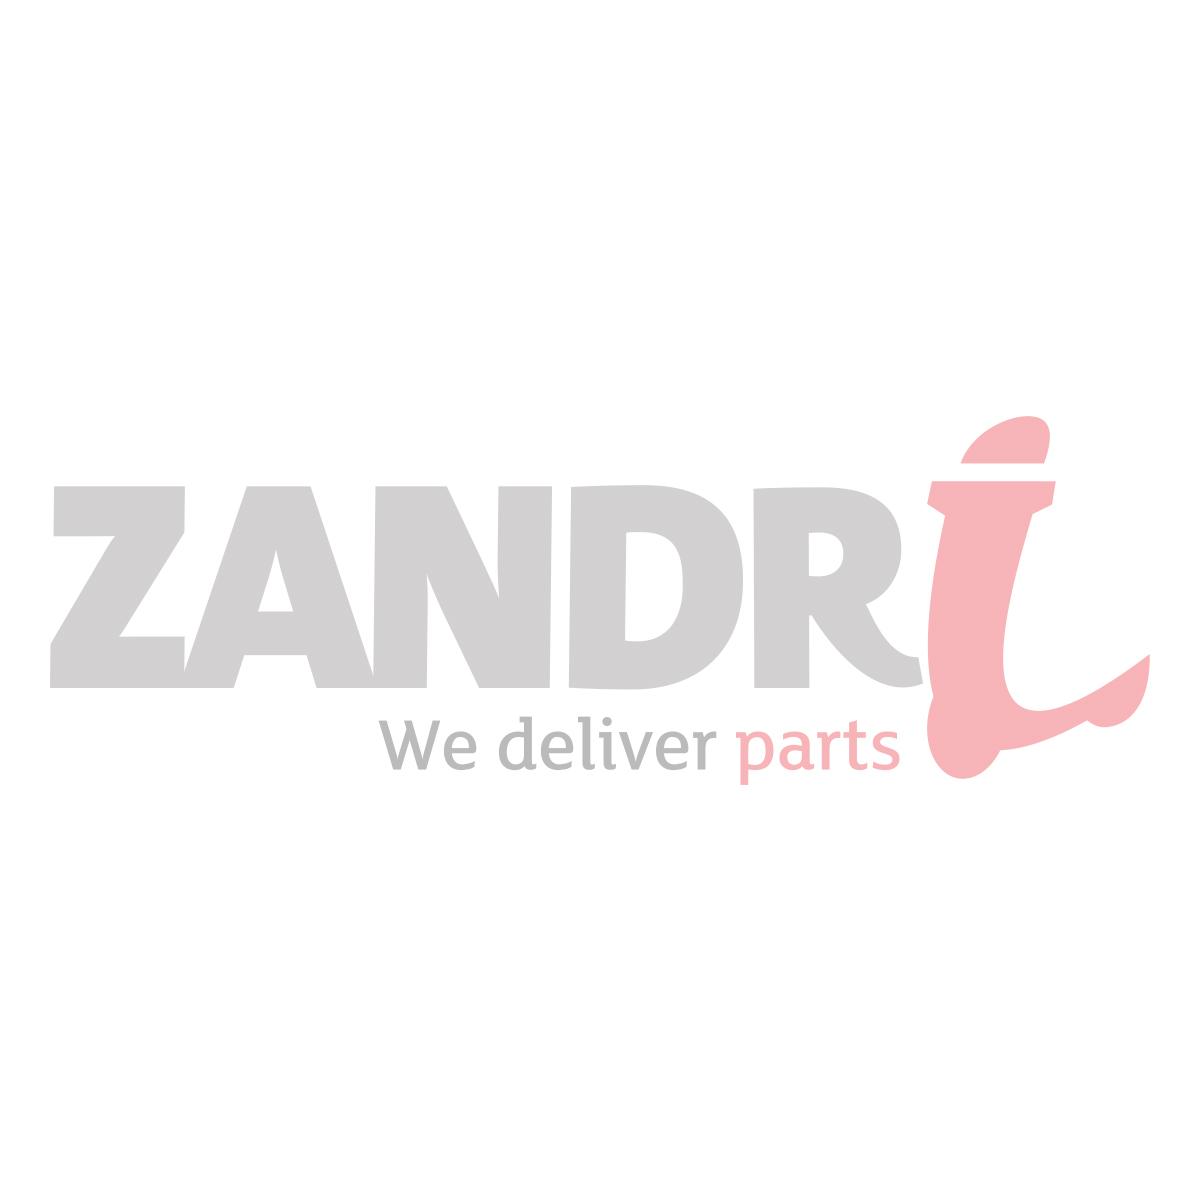 Buddy / Zadelslot vergrendeling China scooter Retro / Torino origineel 110301000bz